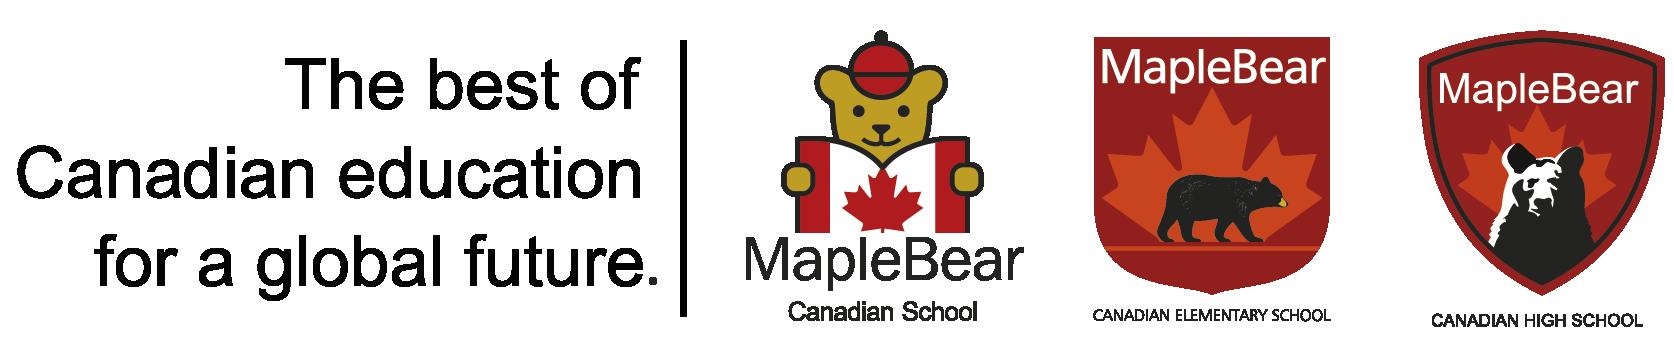 Maple Bear Arequipa